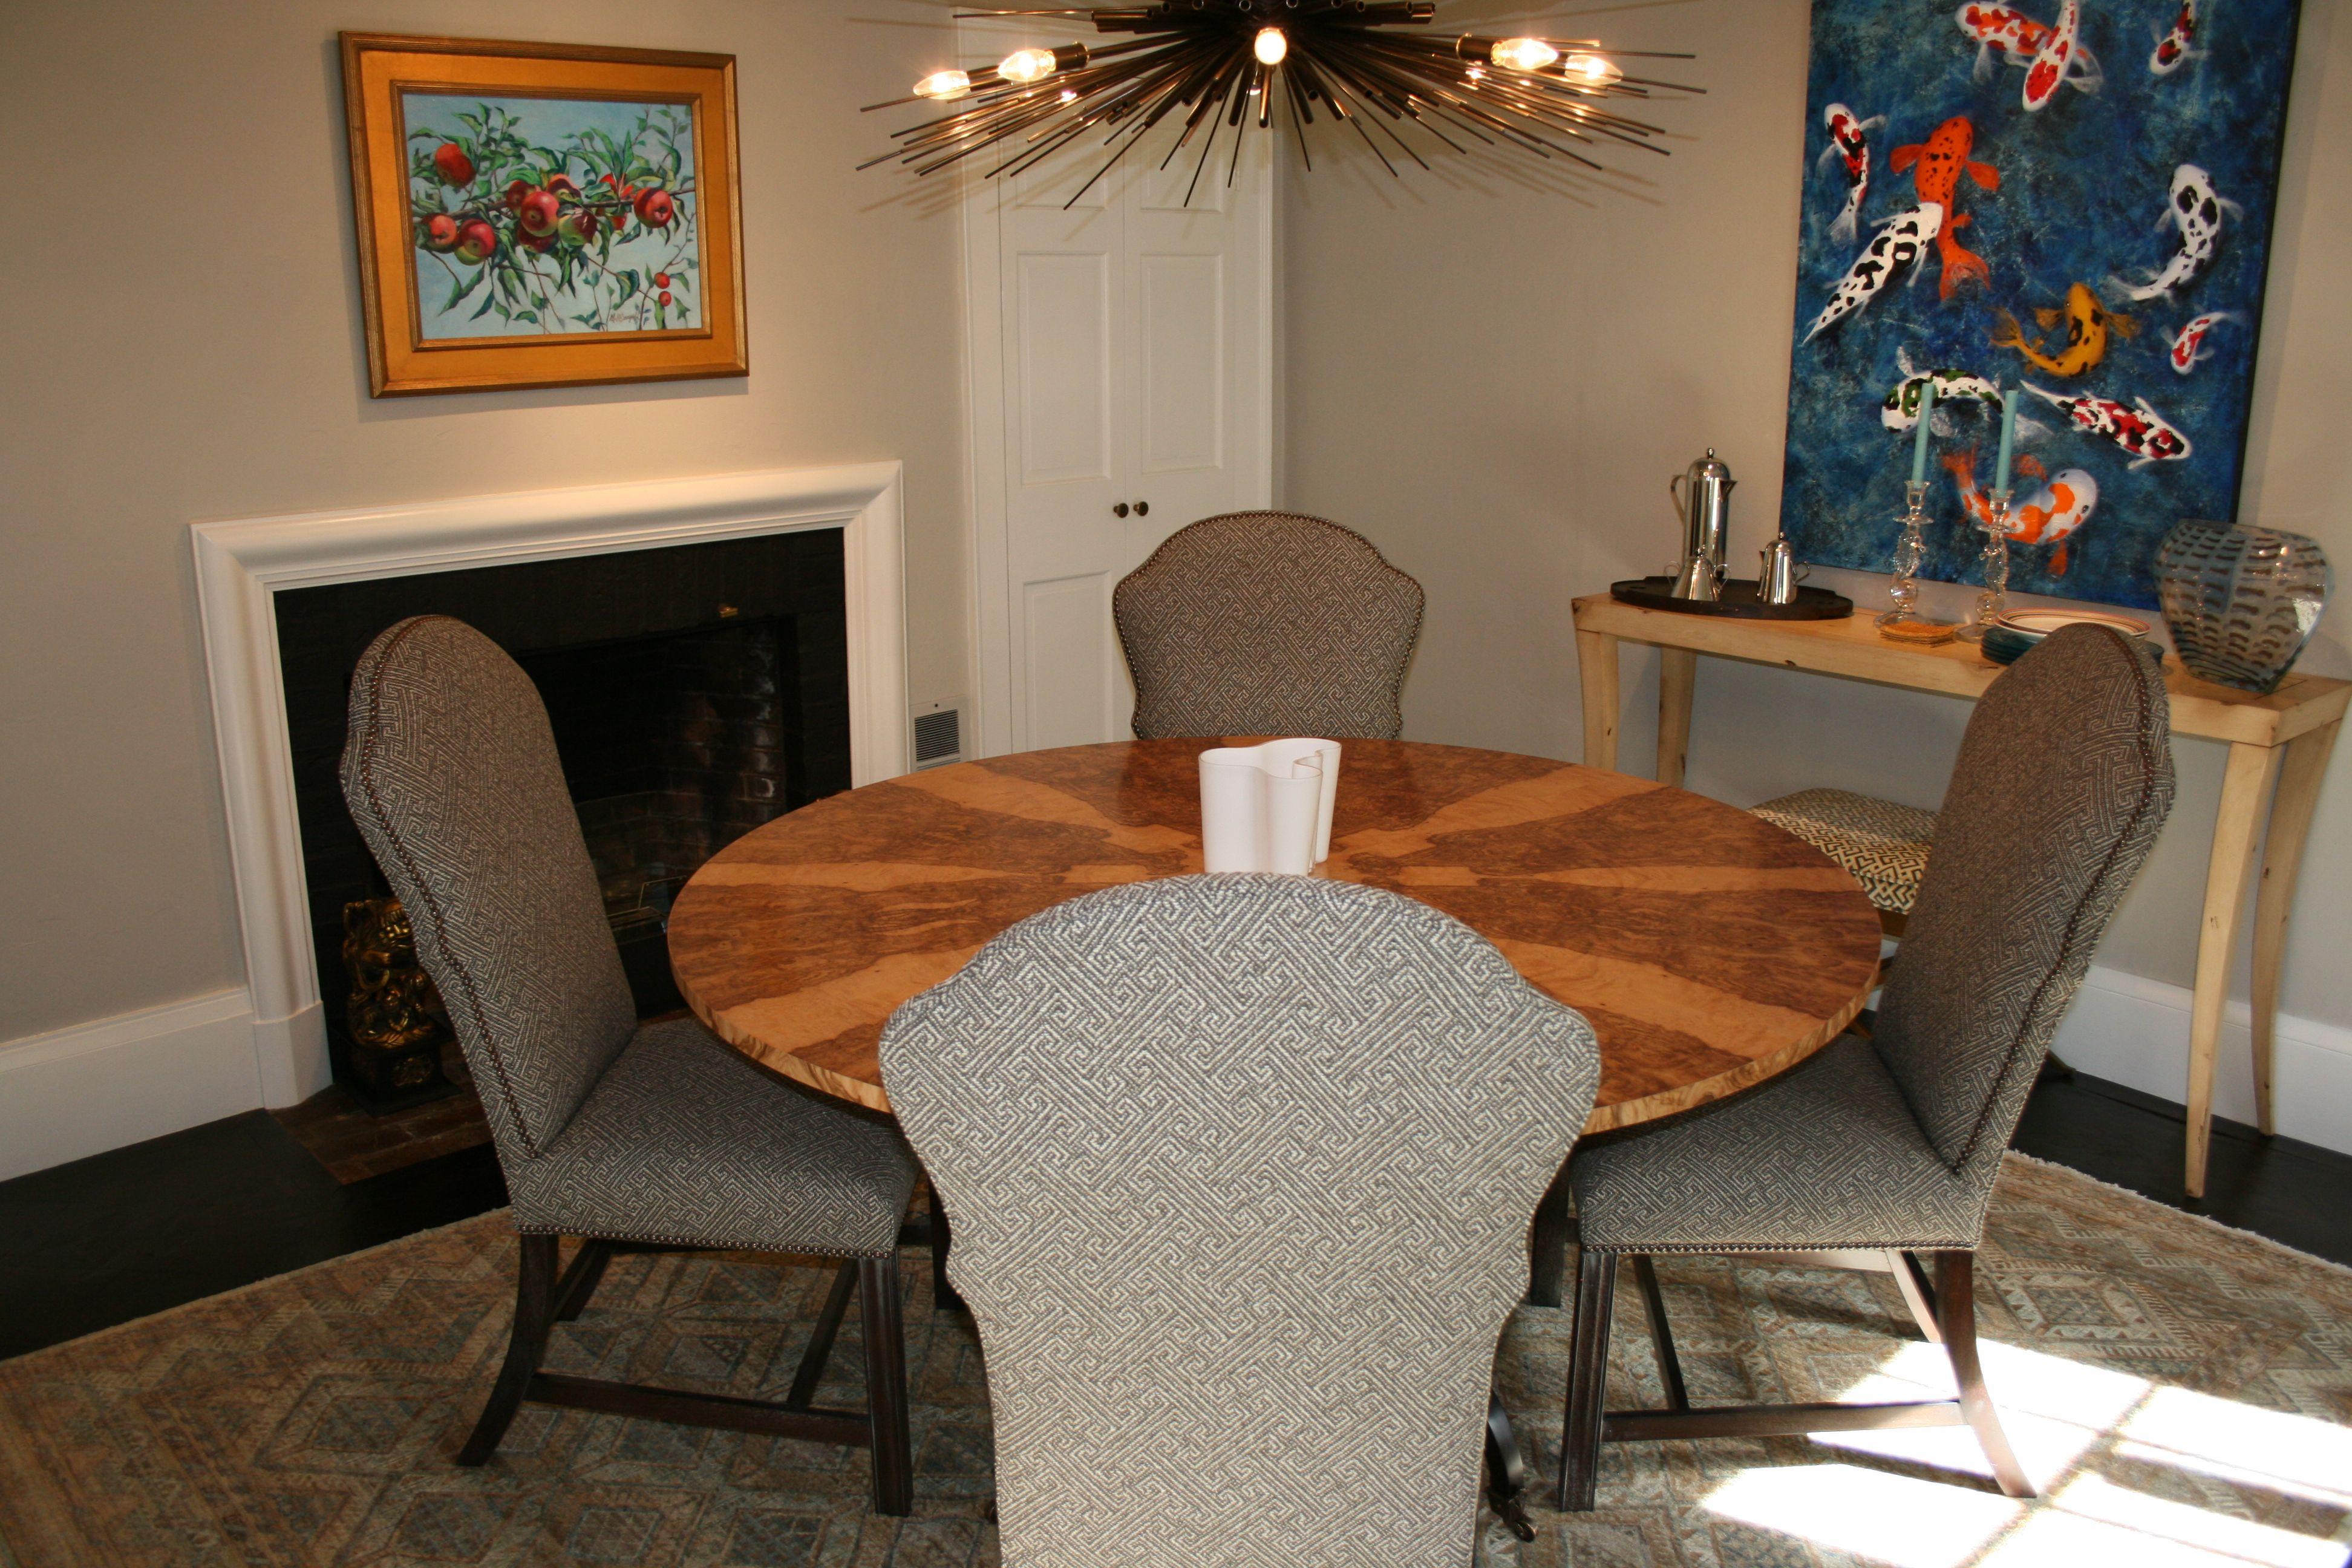 Marlboro Side Chairs, Sutherland Dining Table, Milo